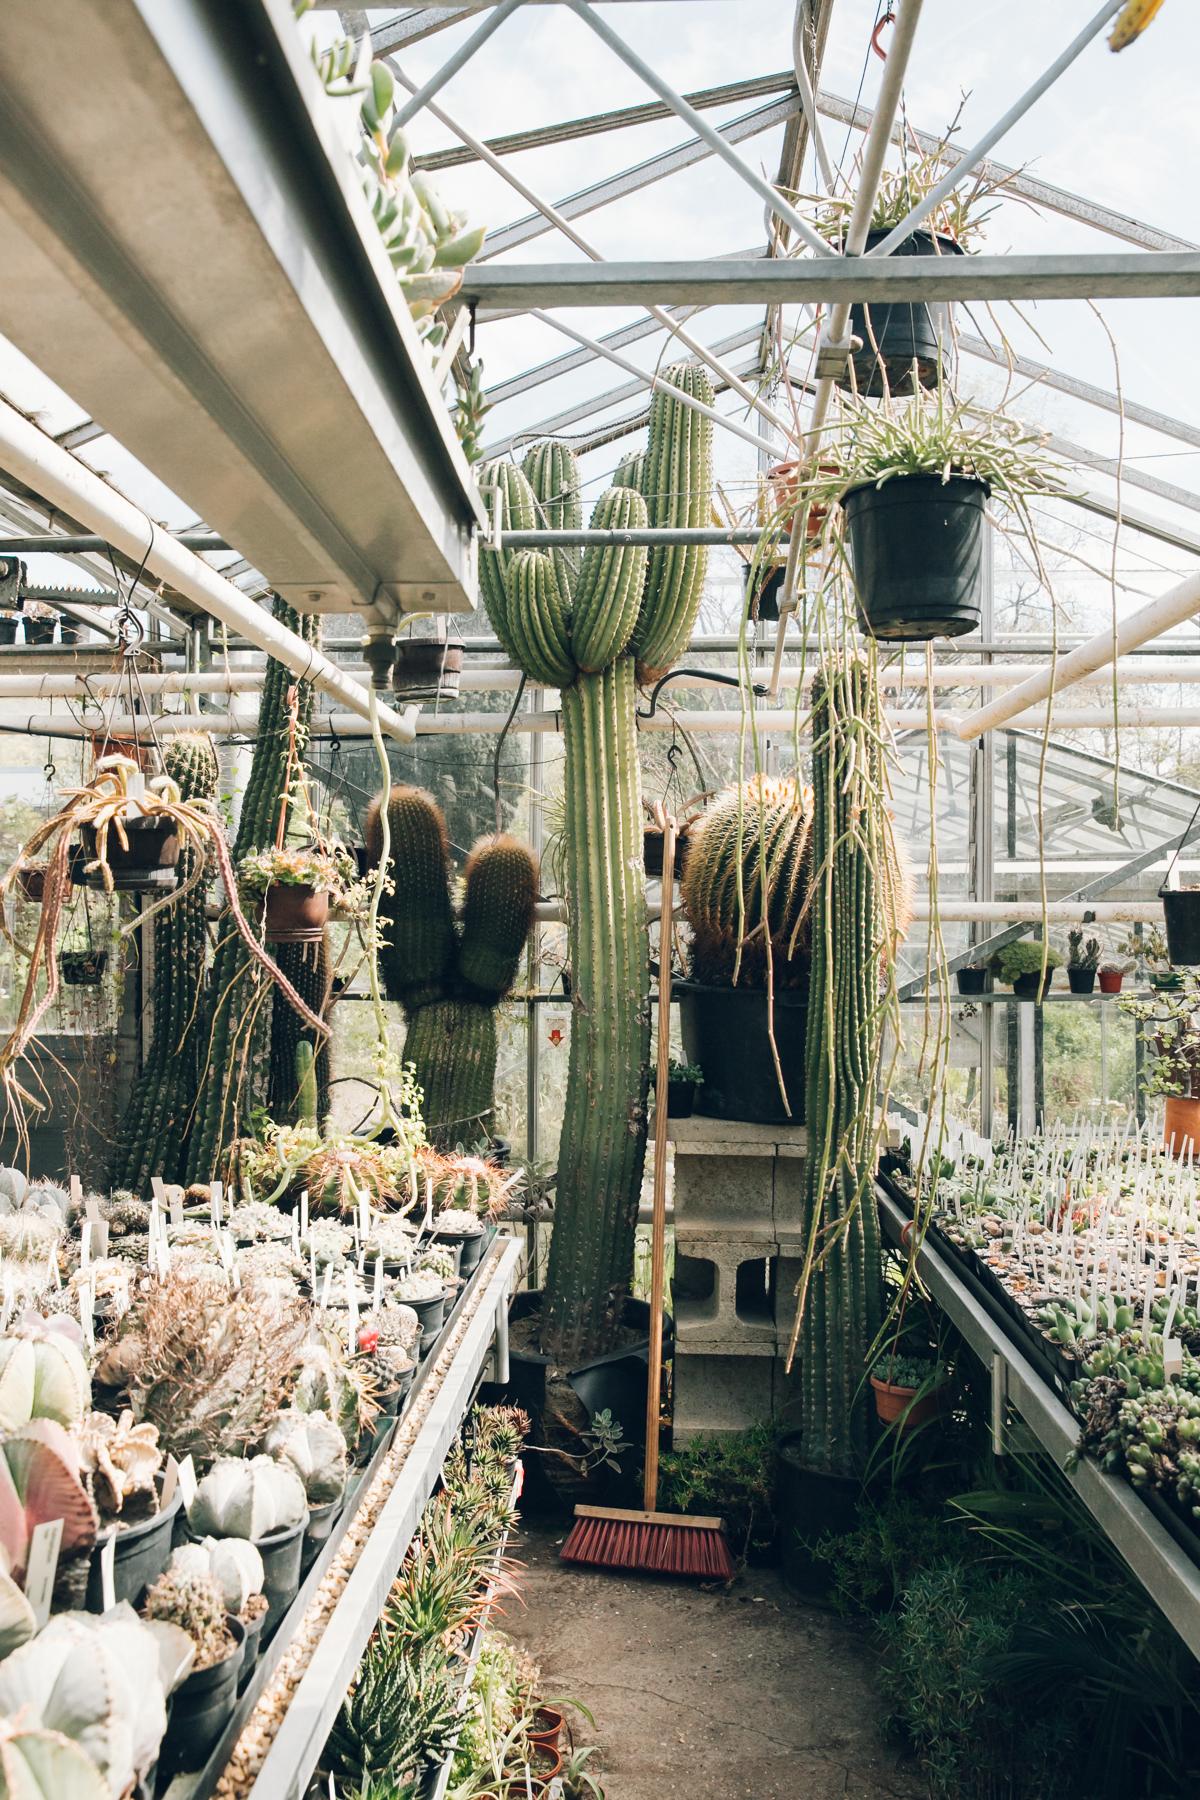 Inside the glasshouses at Botanische Tuin Zuidas in Amsterdam.